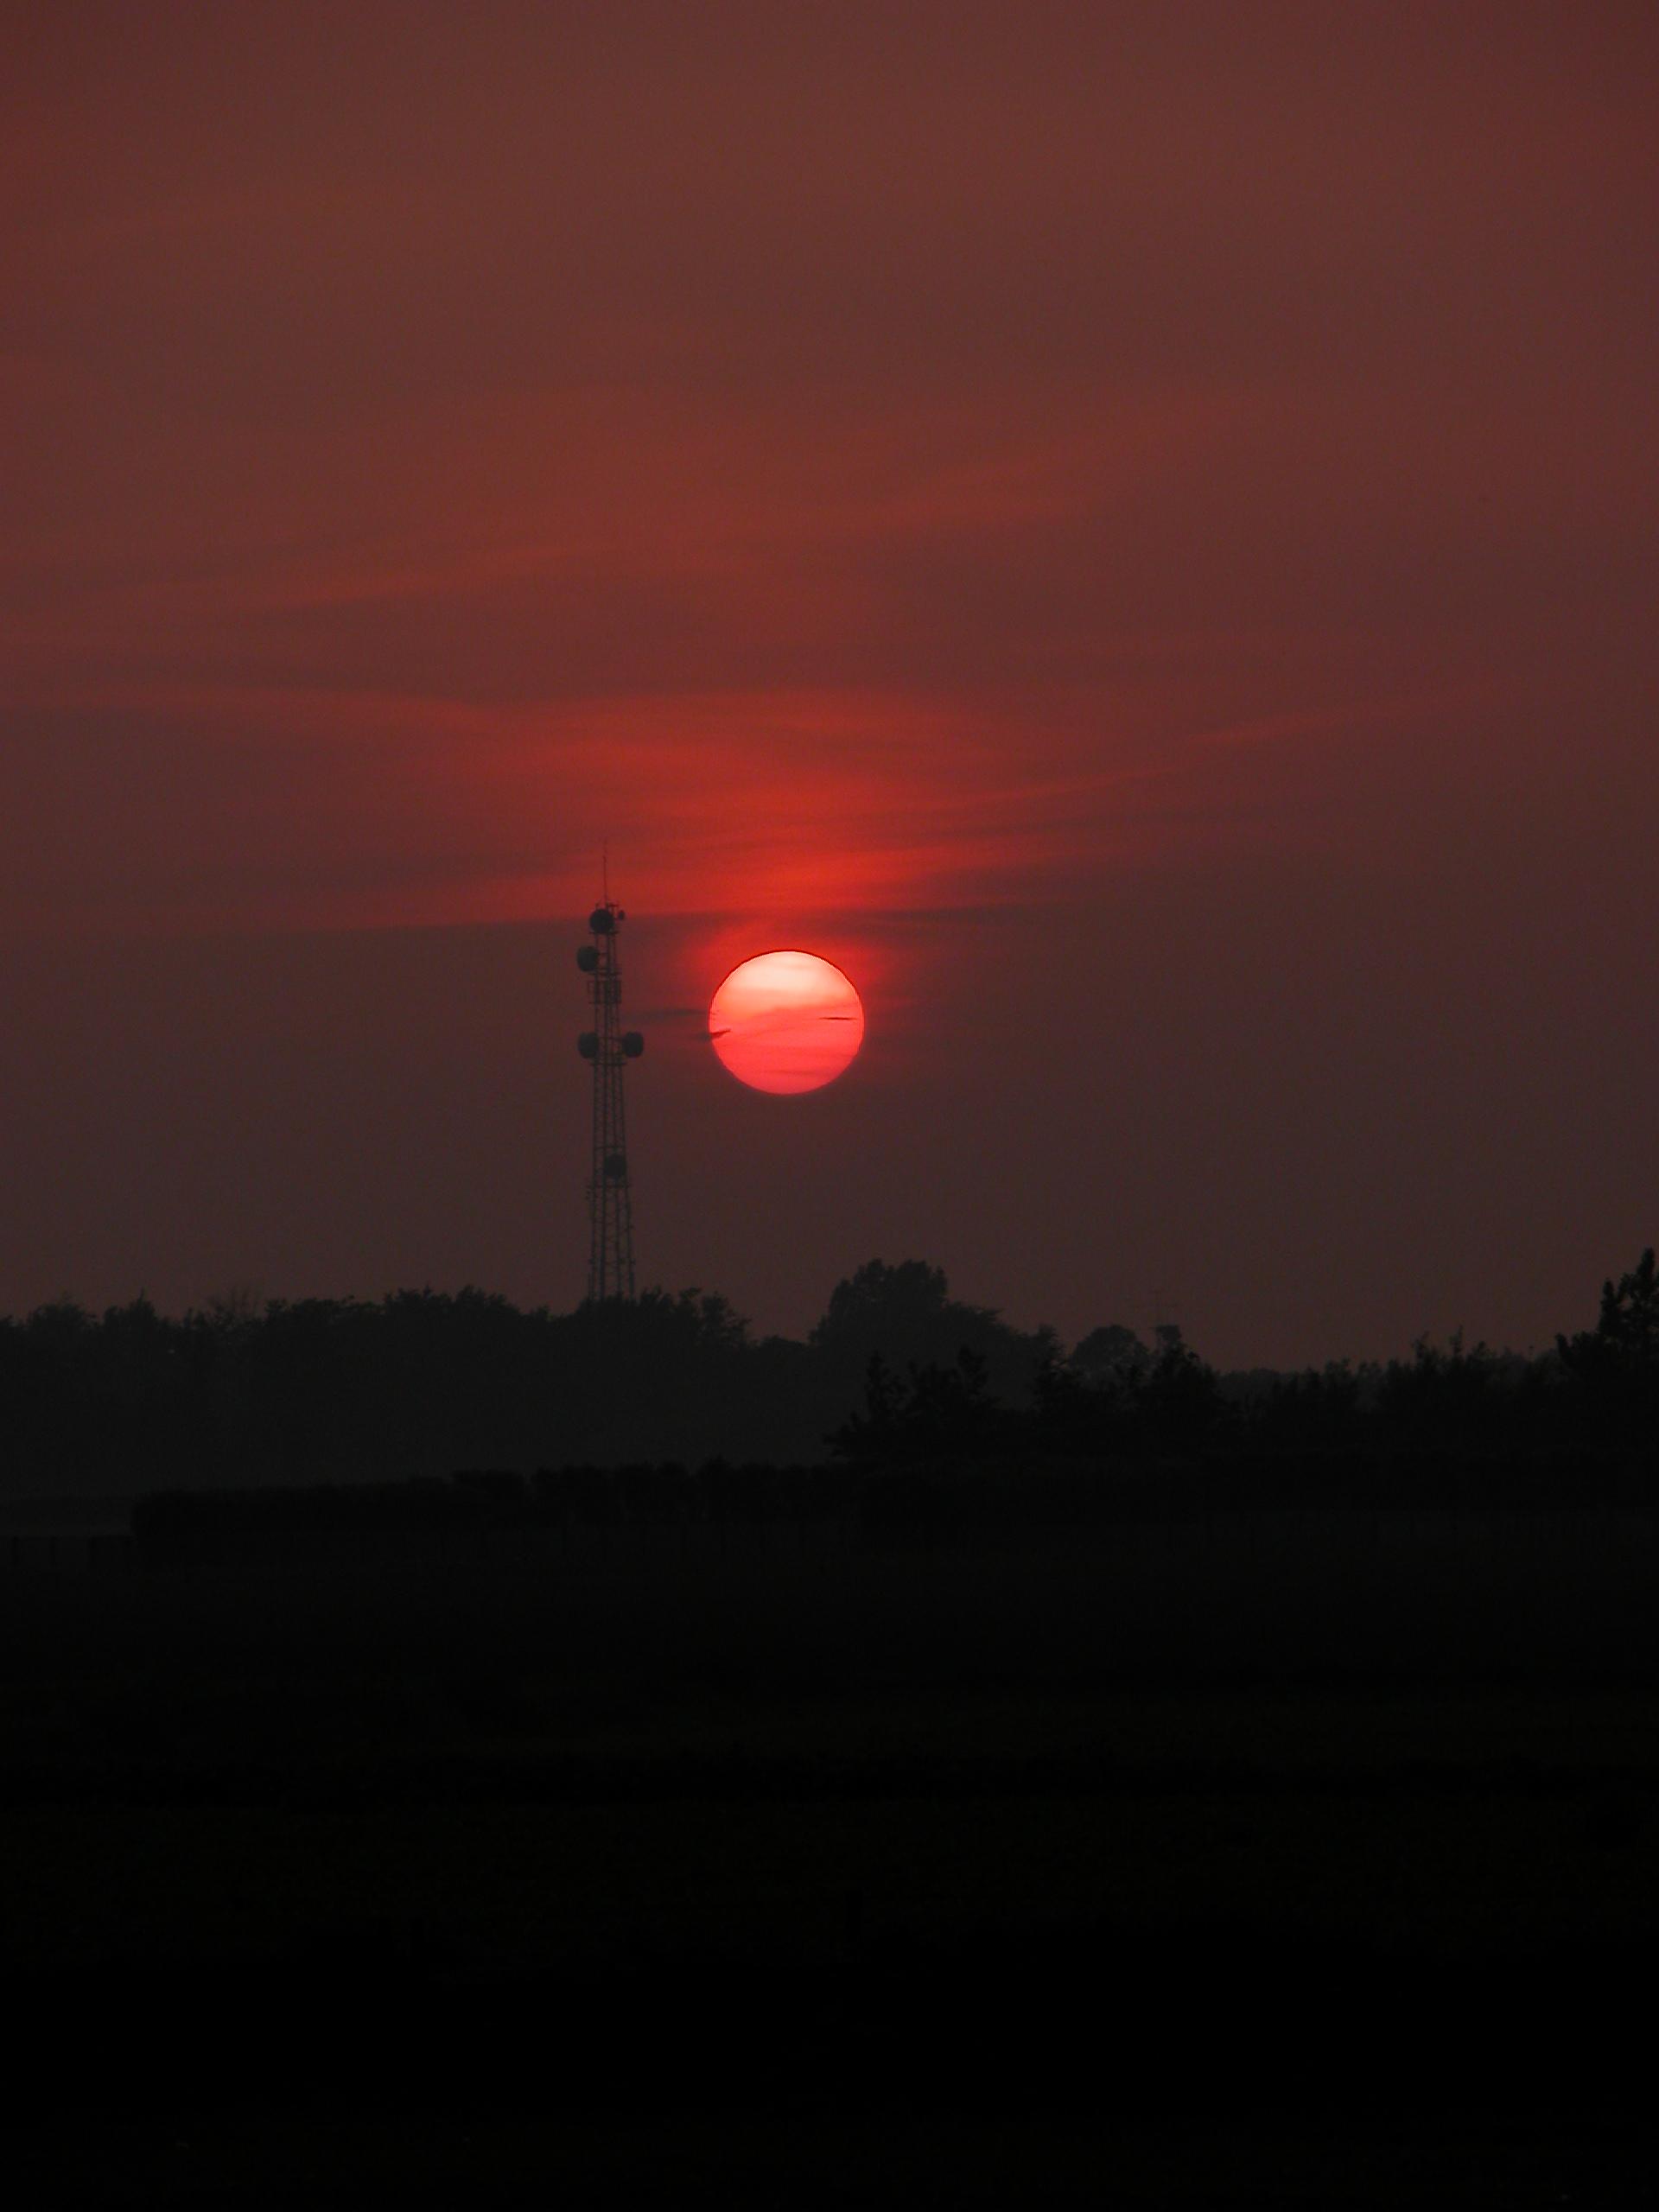 sunset red setting sun television mast broadcasting dark evening darkening